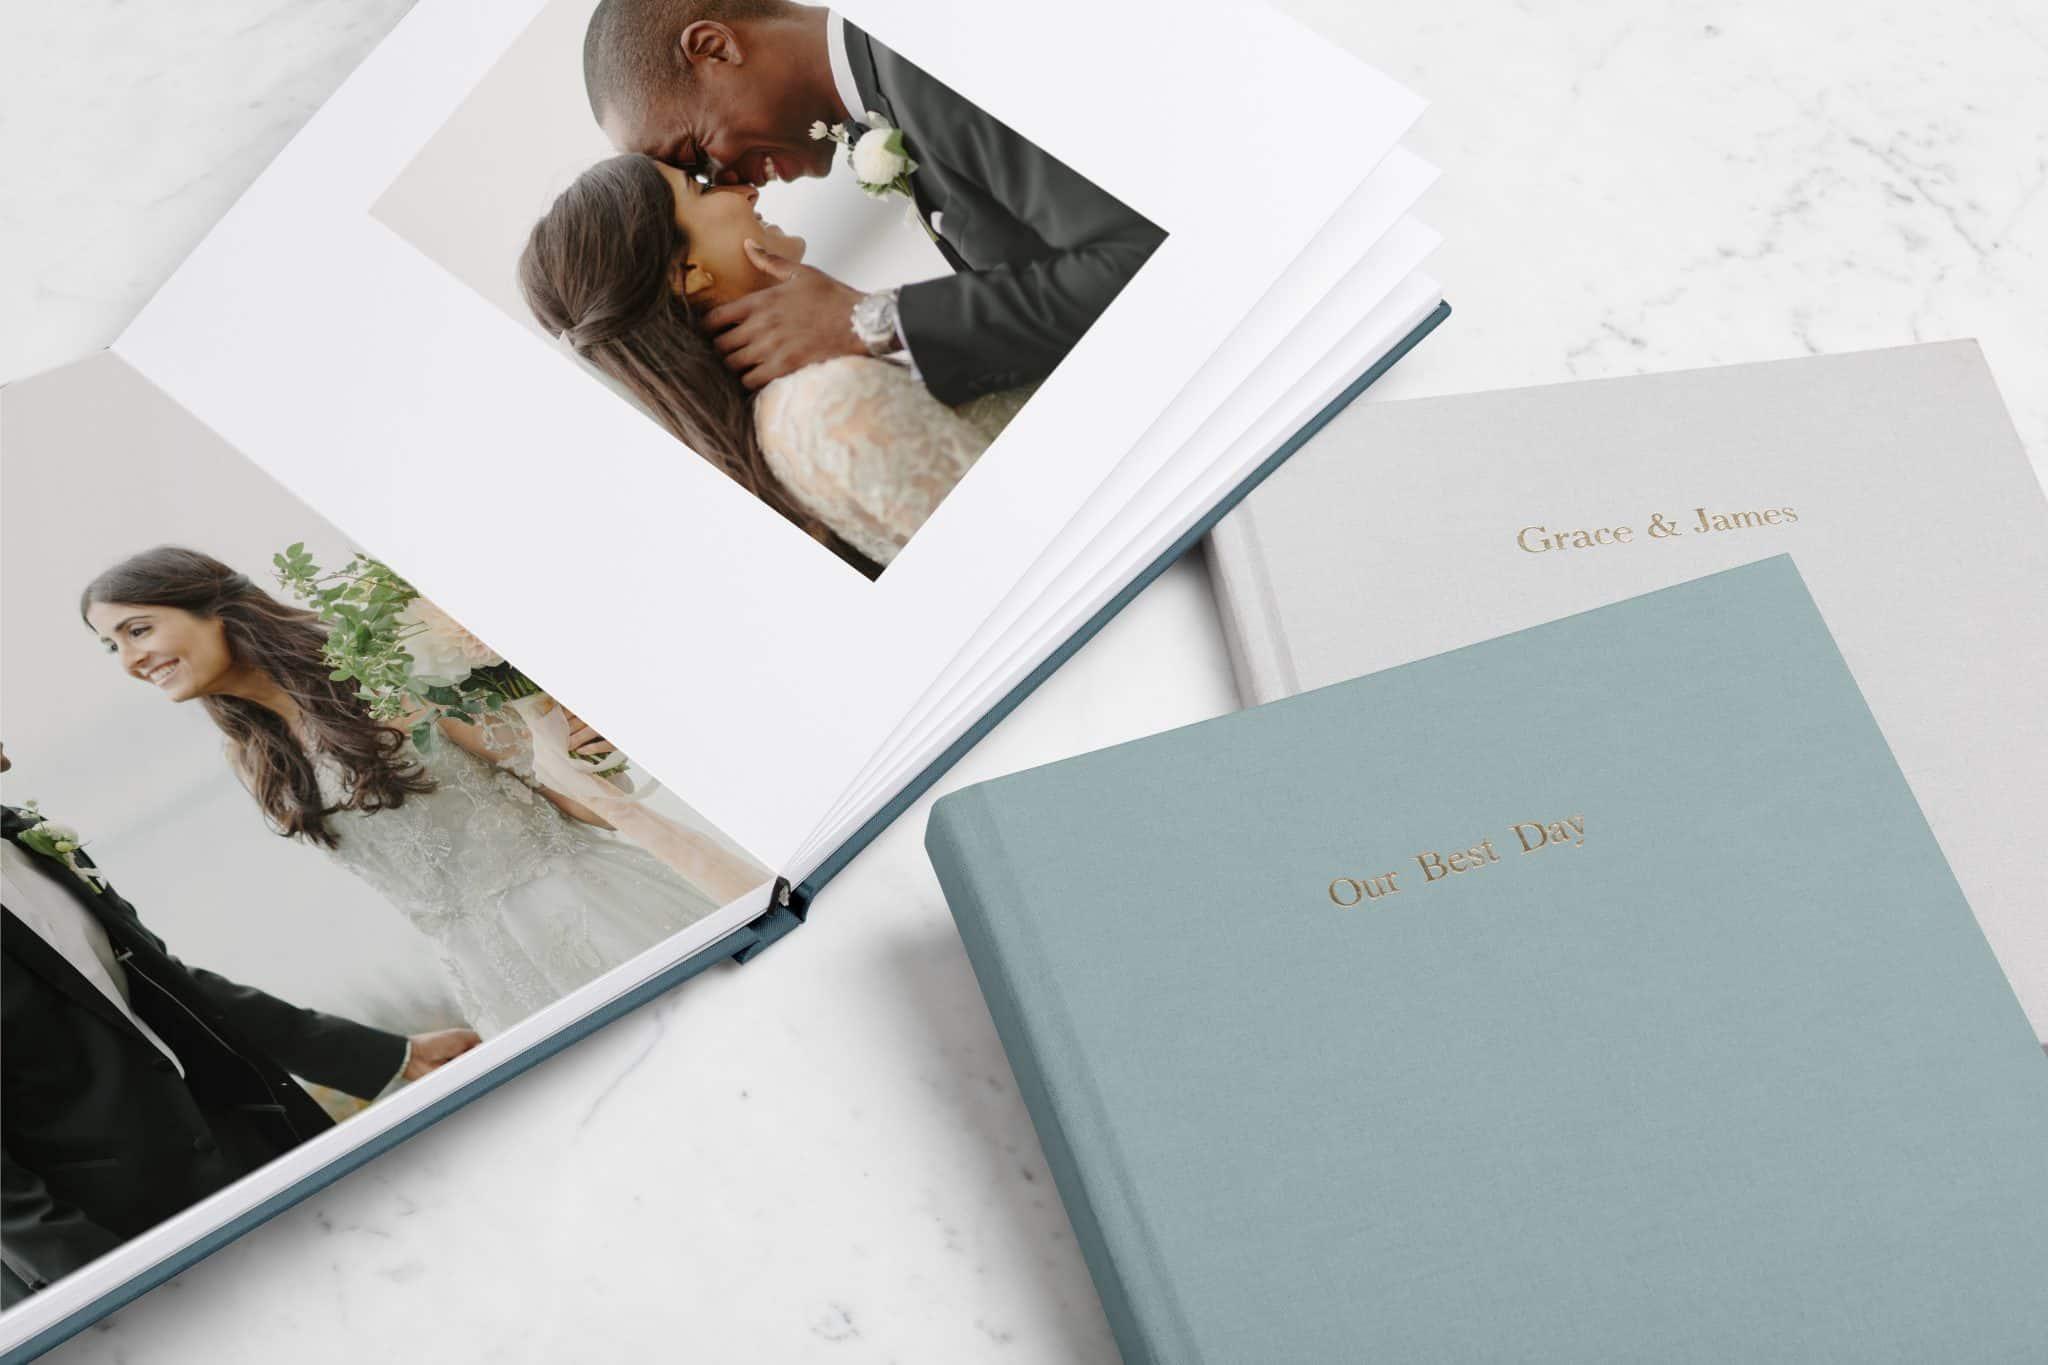 Gorgeous Lay Flat Wedding Albums From Artifact Uprising